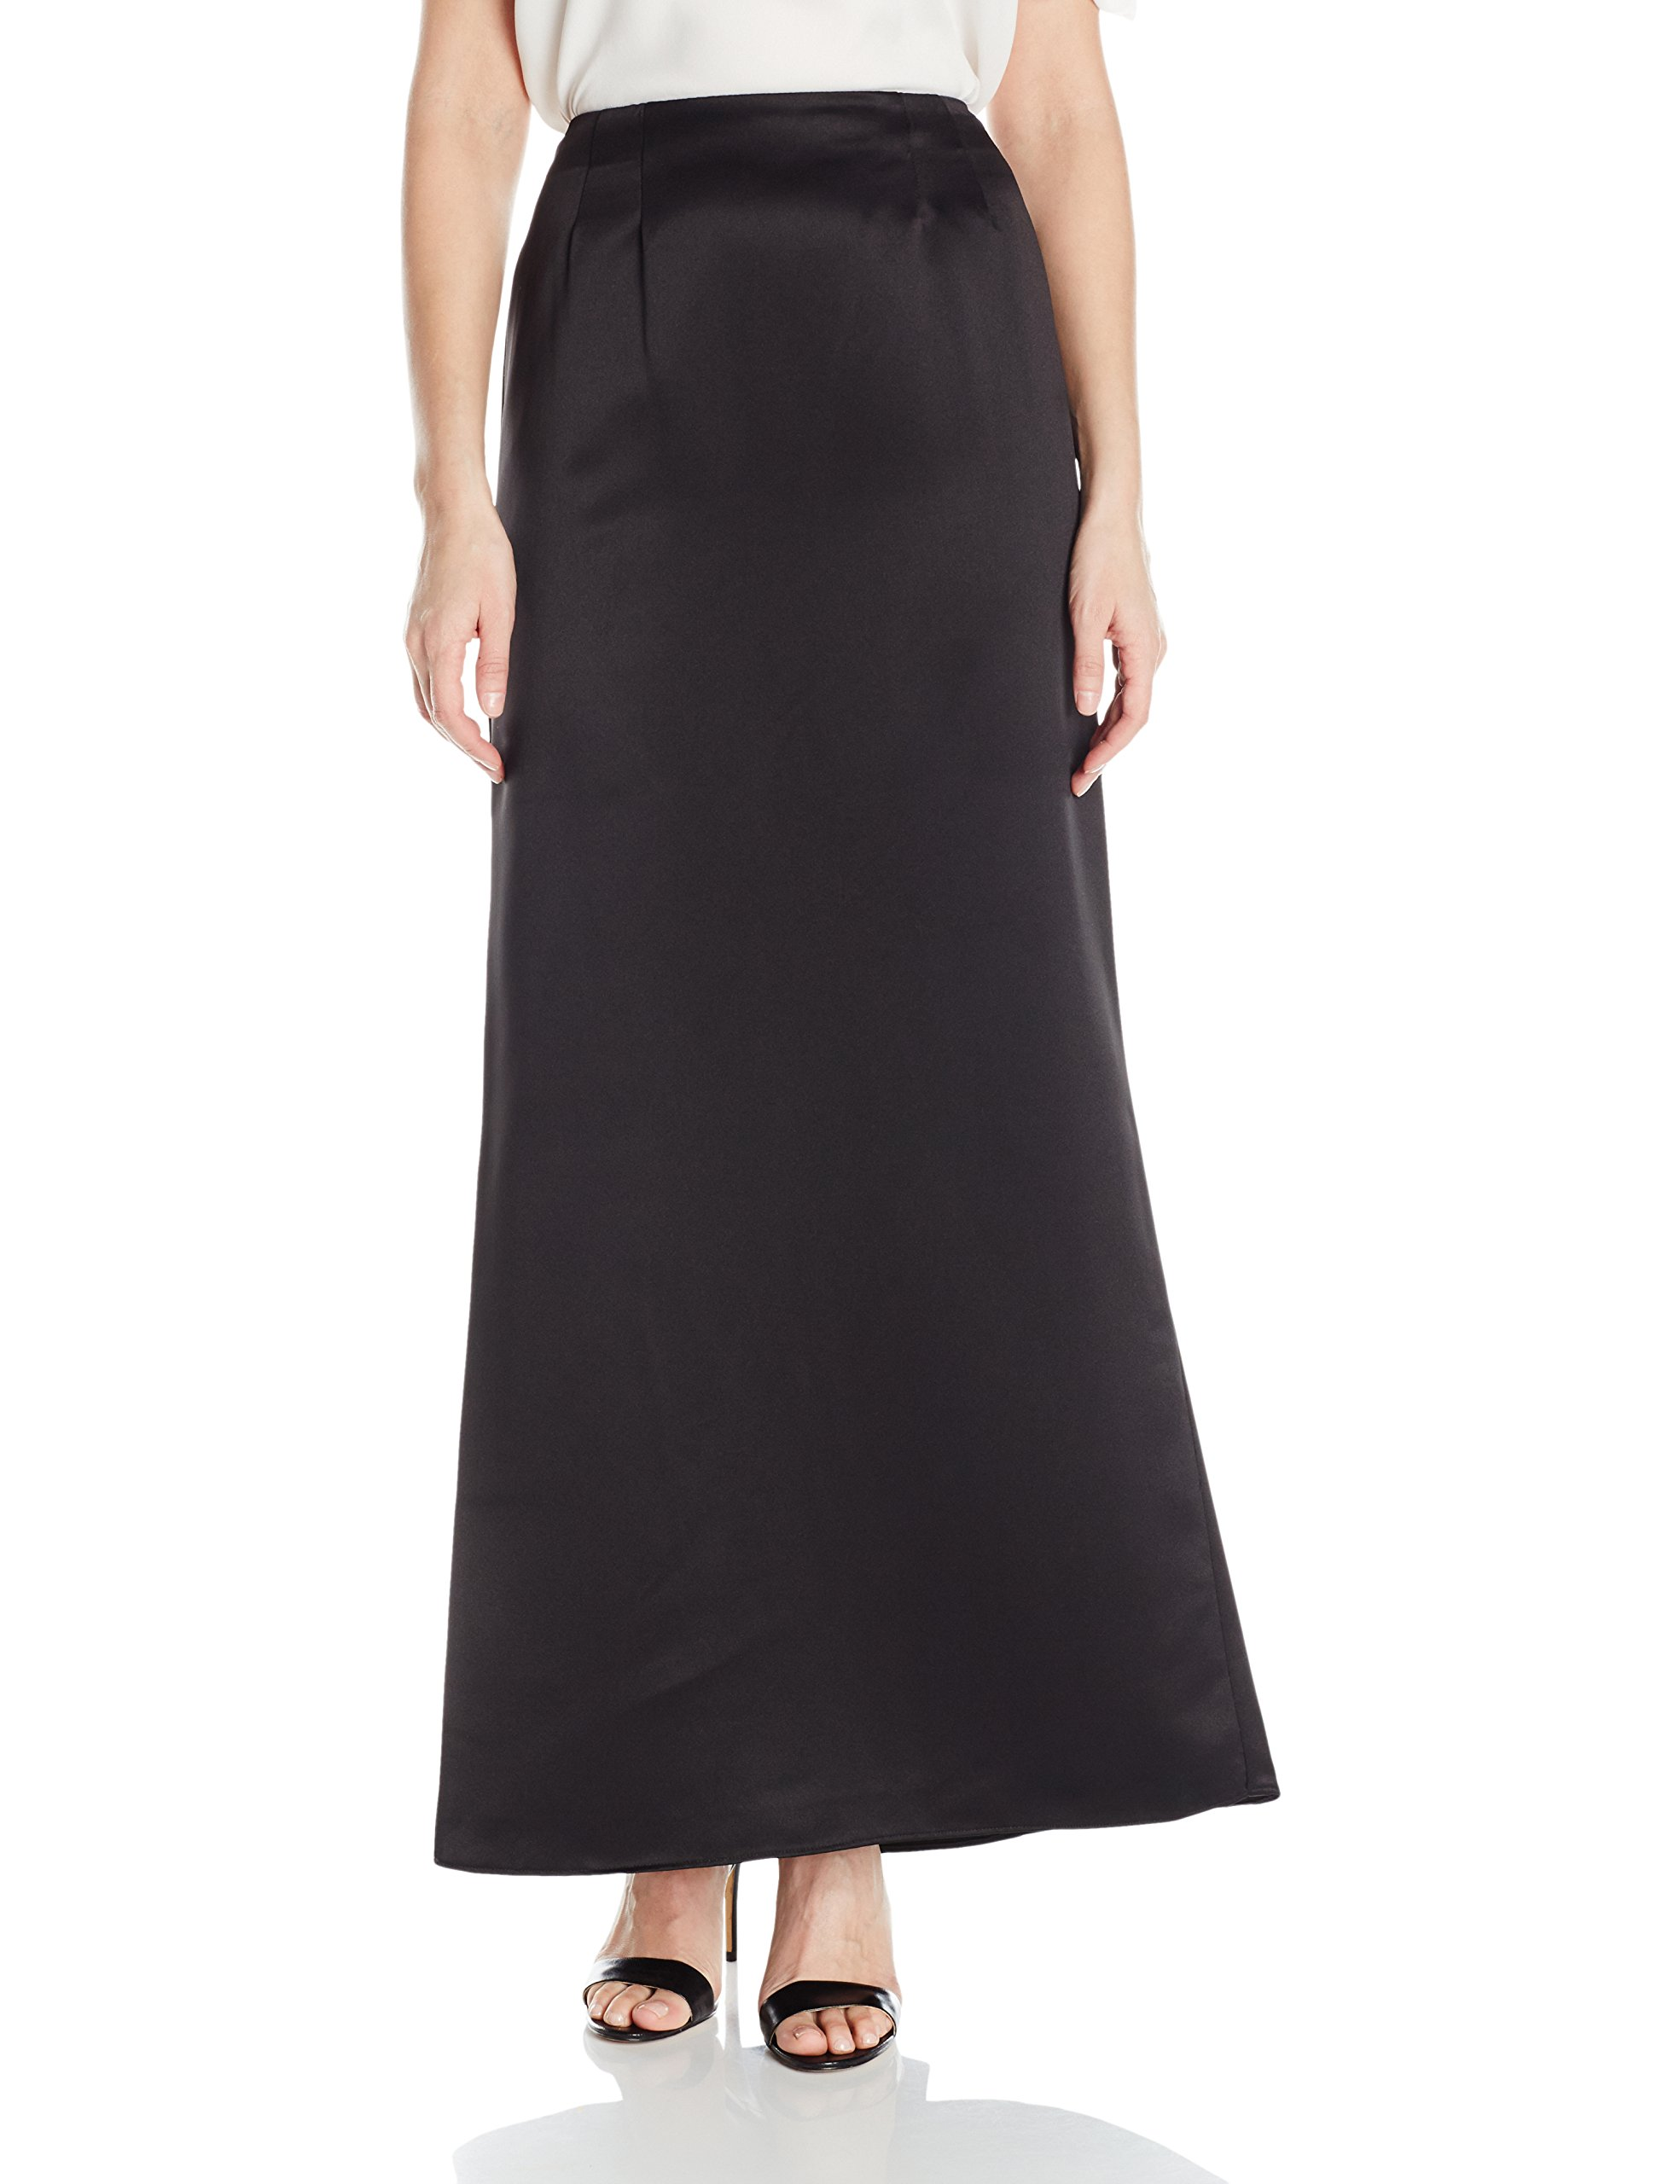 Alex Evenings Women's Long Satin Fishtail Occasion Skirt, Black, M by Alex Evenings